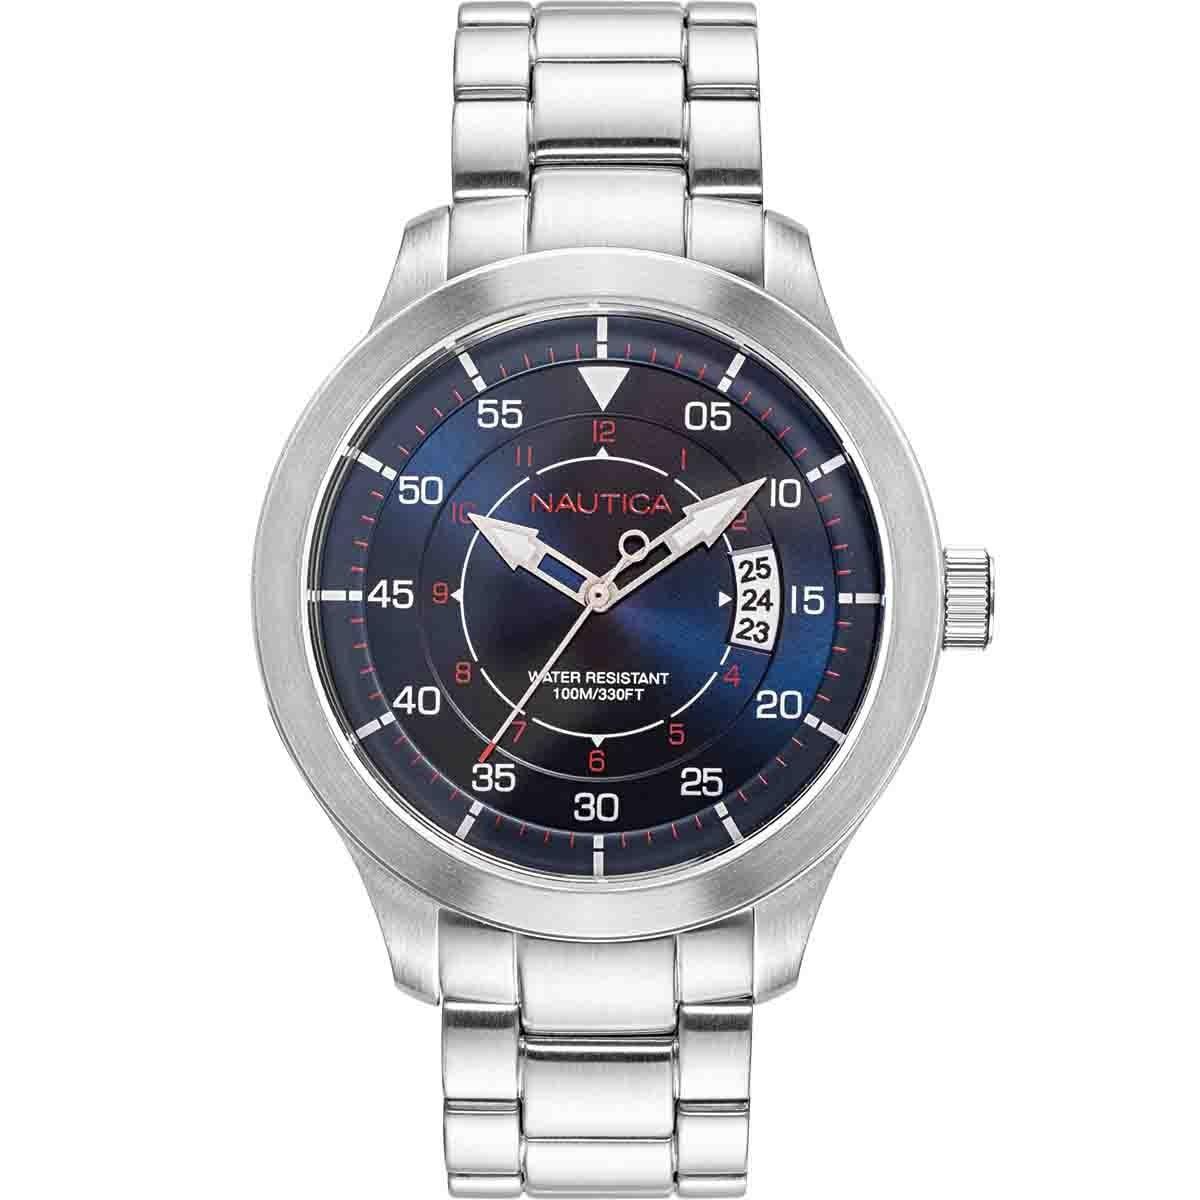 Reloj para Caballero Color Plata Nautica